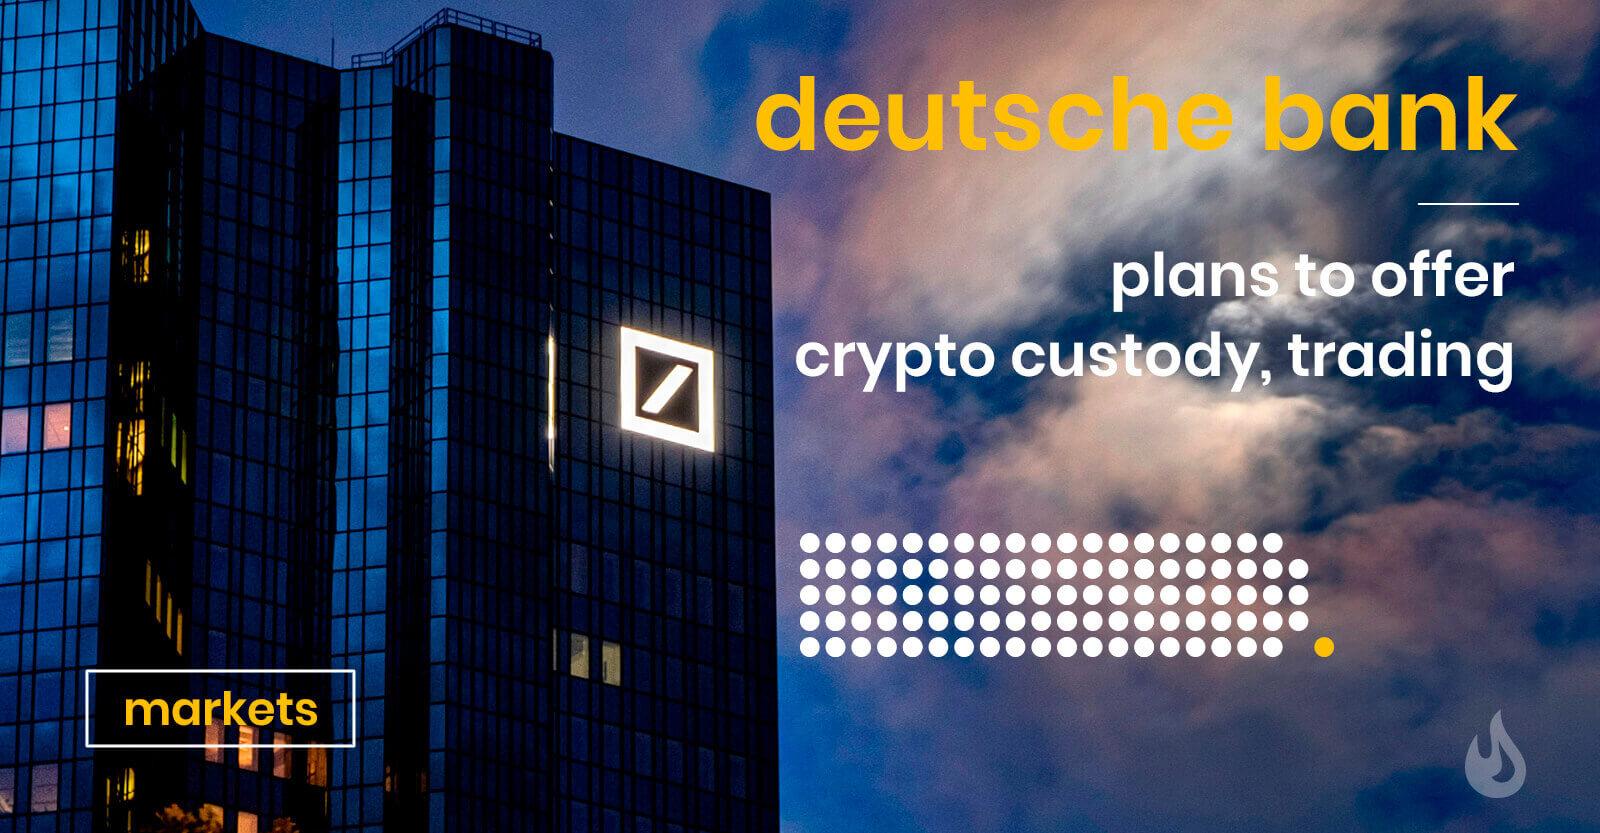 Deutsche Bank to Offer Crypto Services — DailyCoin